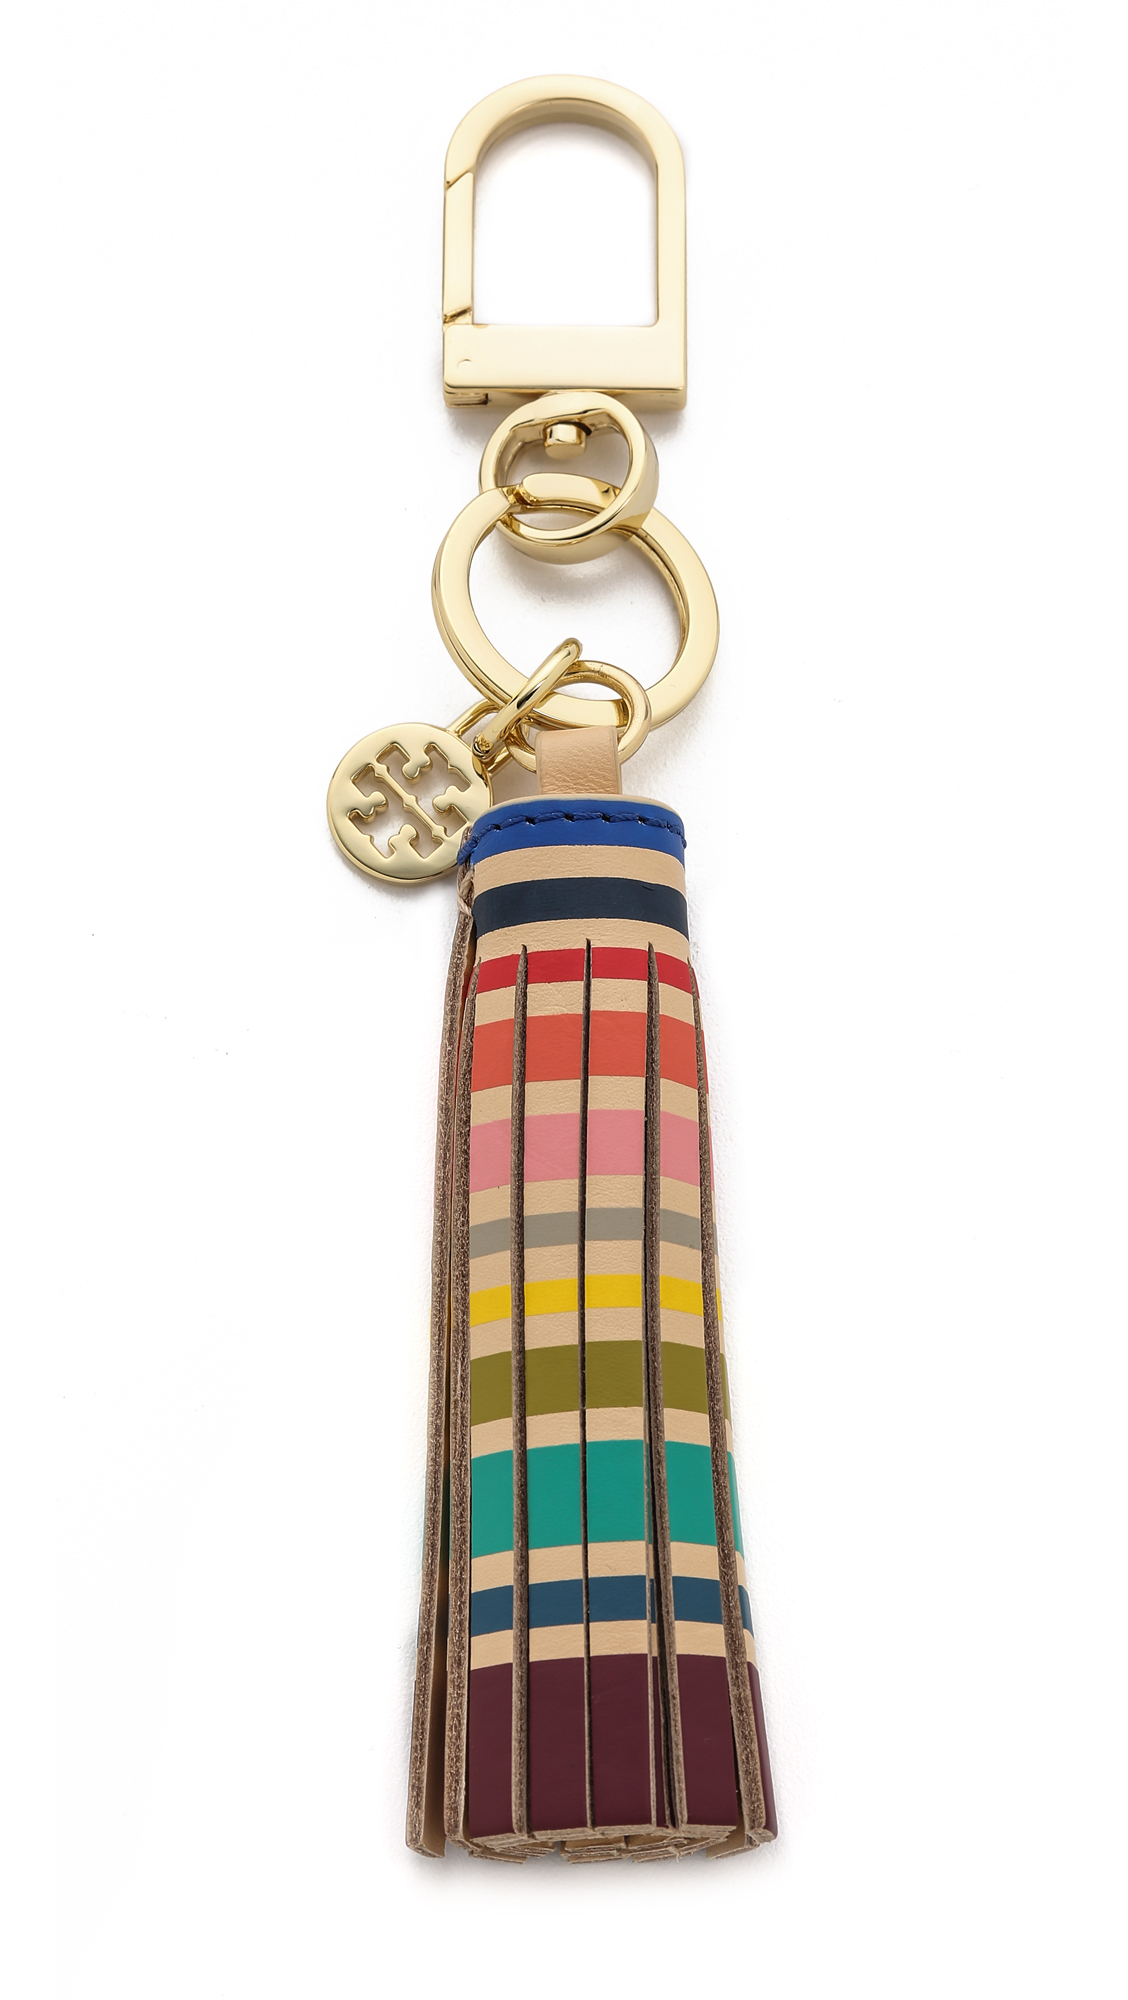 Lyst - Tory Burch Multi Color Tassel Key Chain - Vachetta